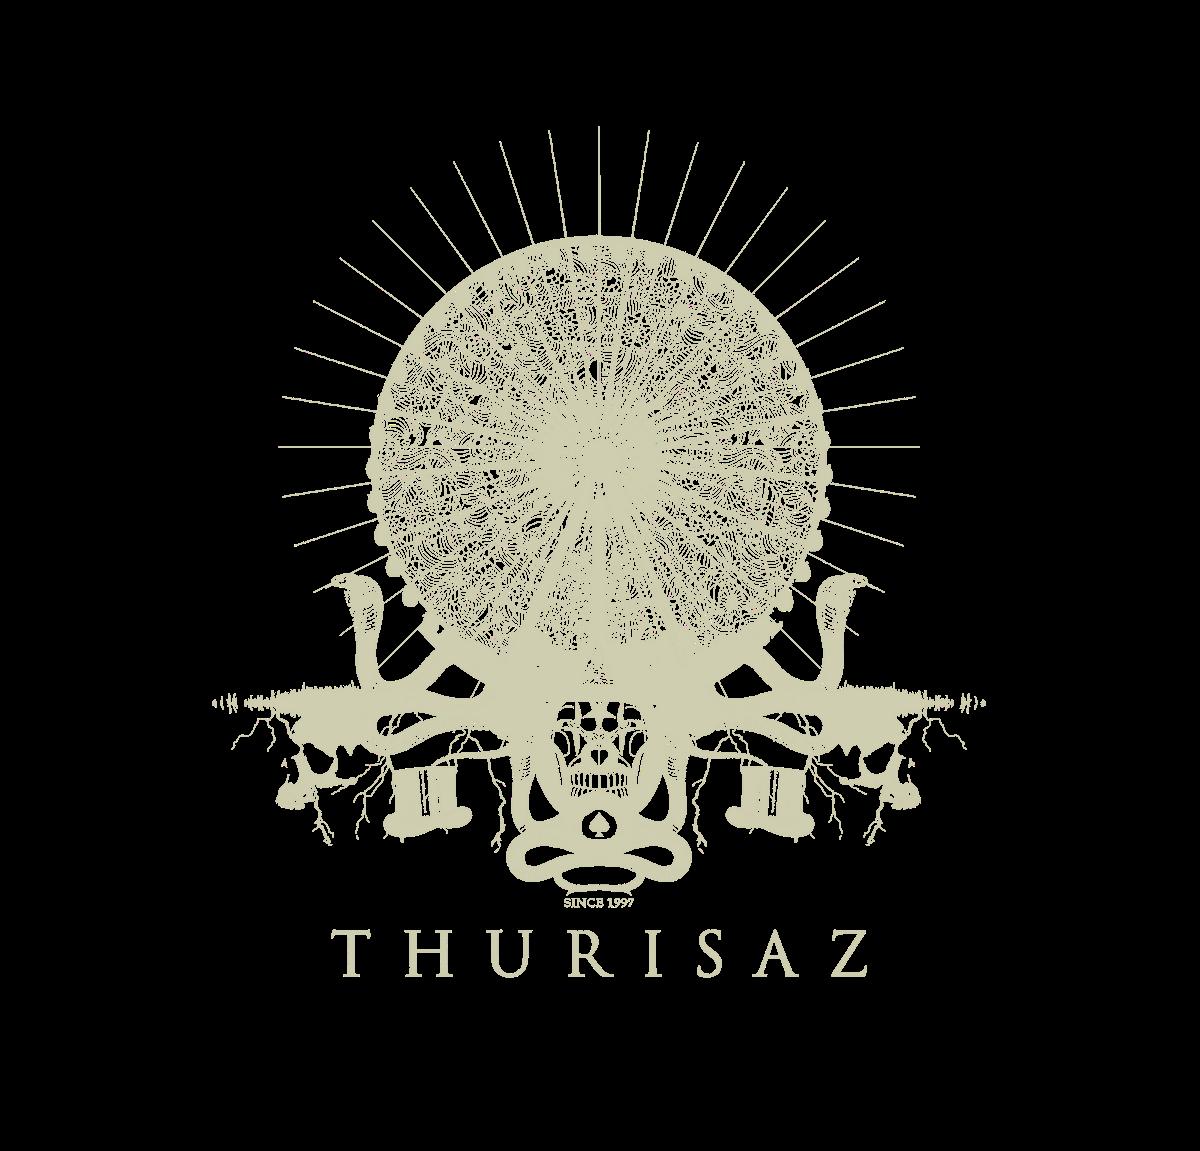 graphisme,T-Shirt Design,Thurisaz,metal band,Screenprinting,ILLUSTRATION ,Apparel Design,sérigraphie